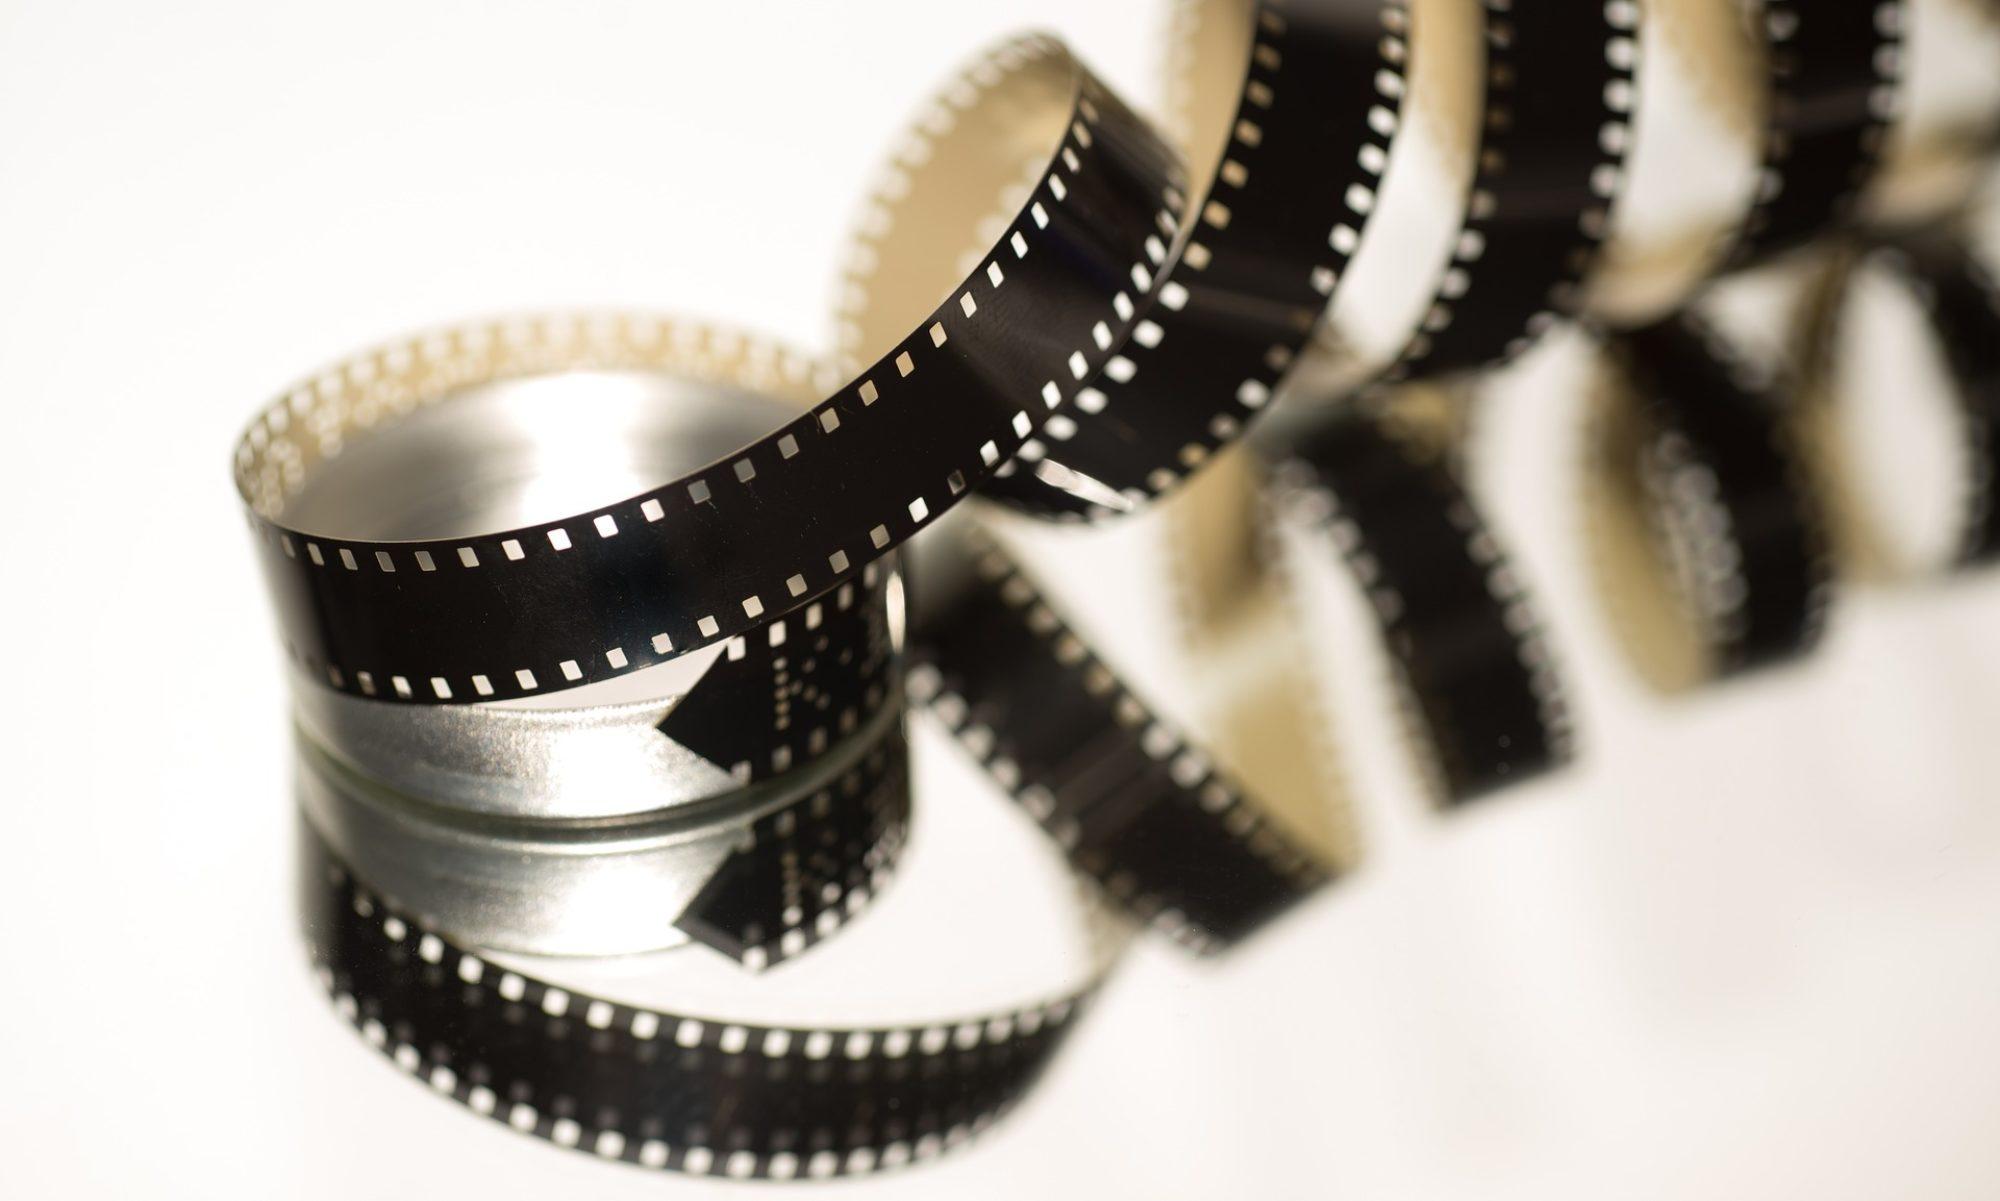 8mm Movies